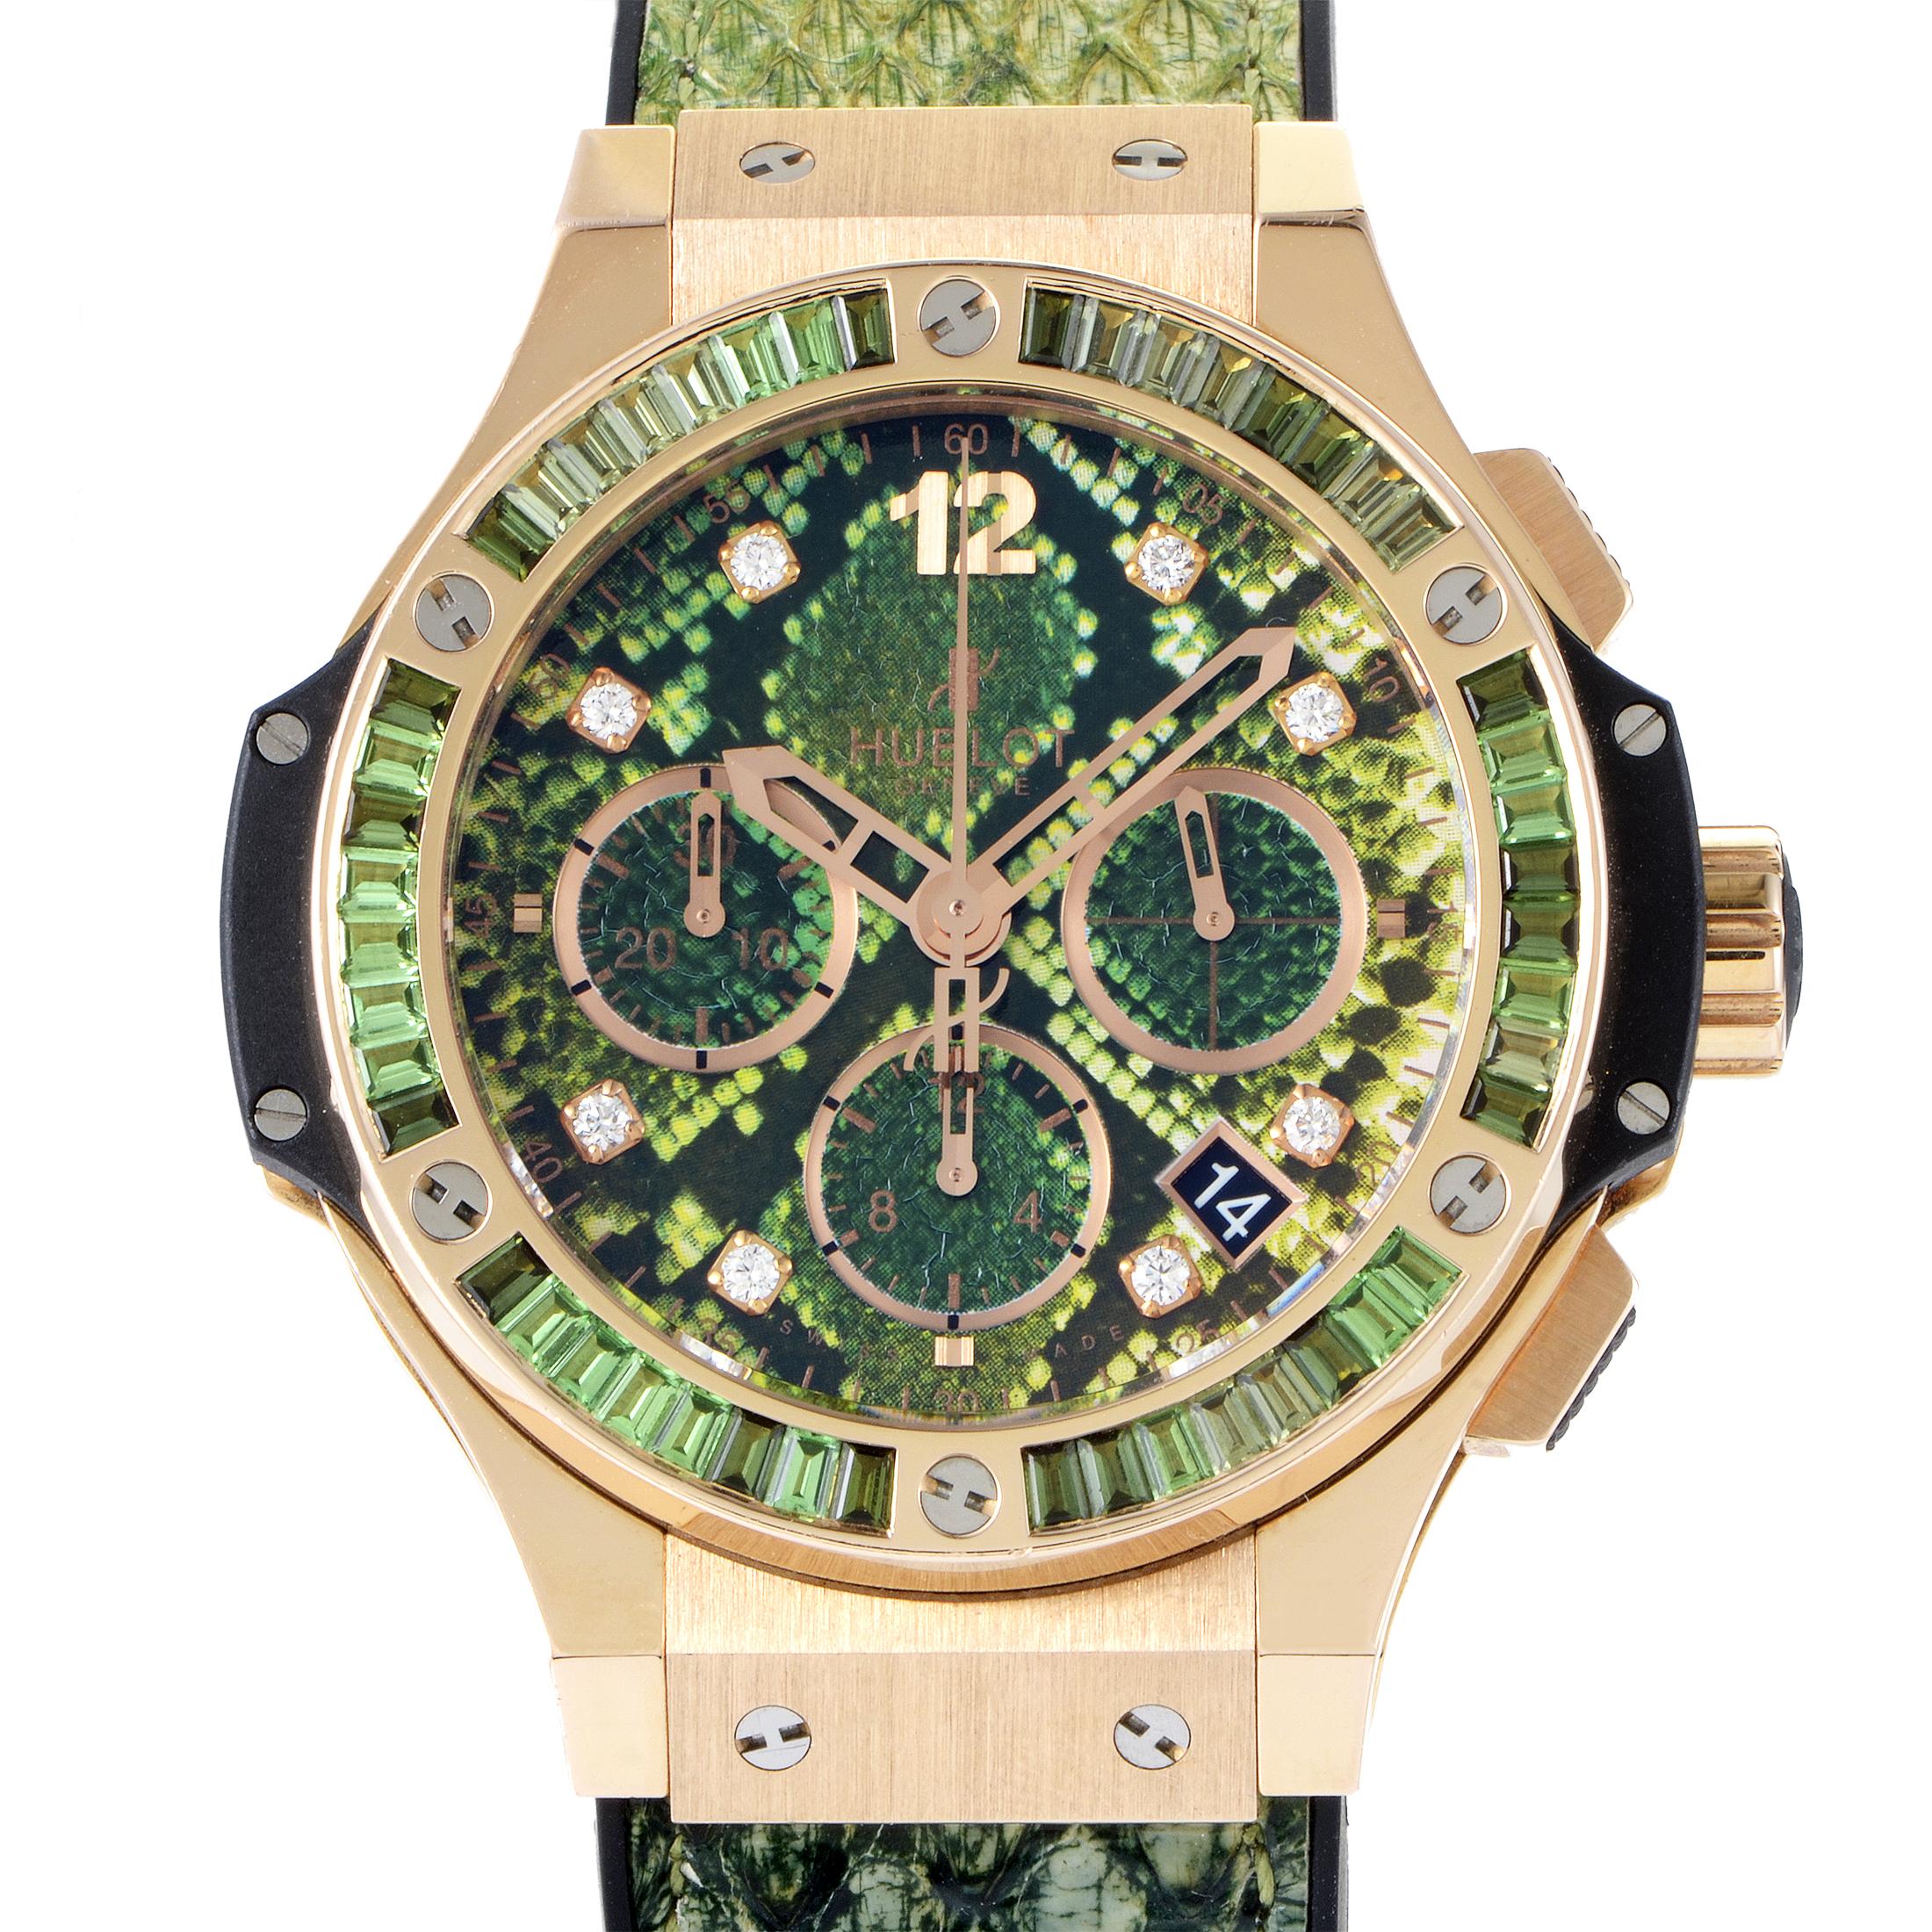 Boa Big Bang Green Automatic Chronograph Watch 341.PX.7818.PR.1978